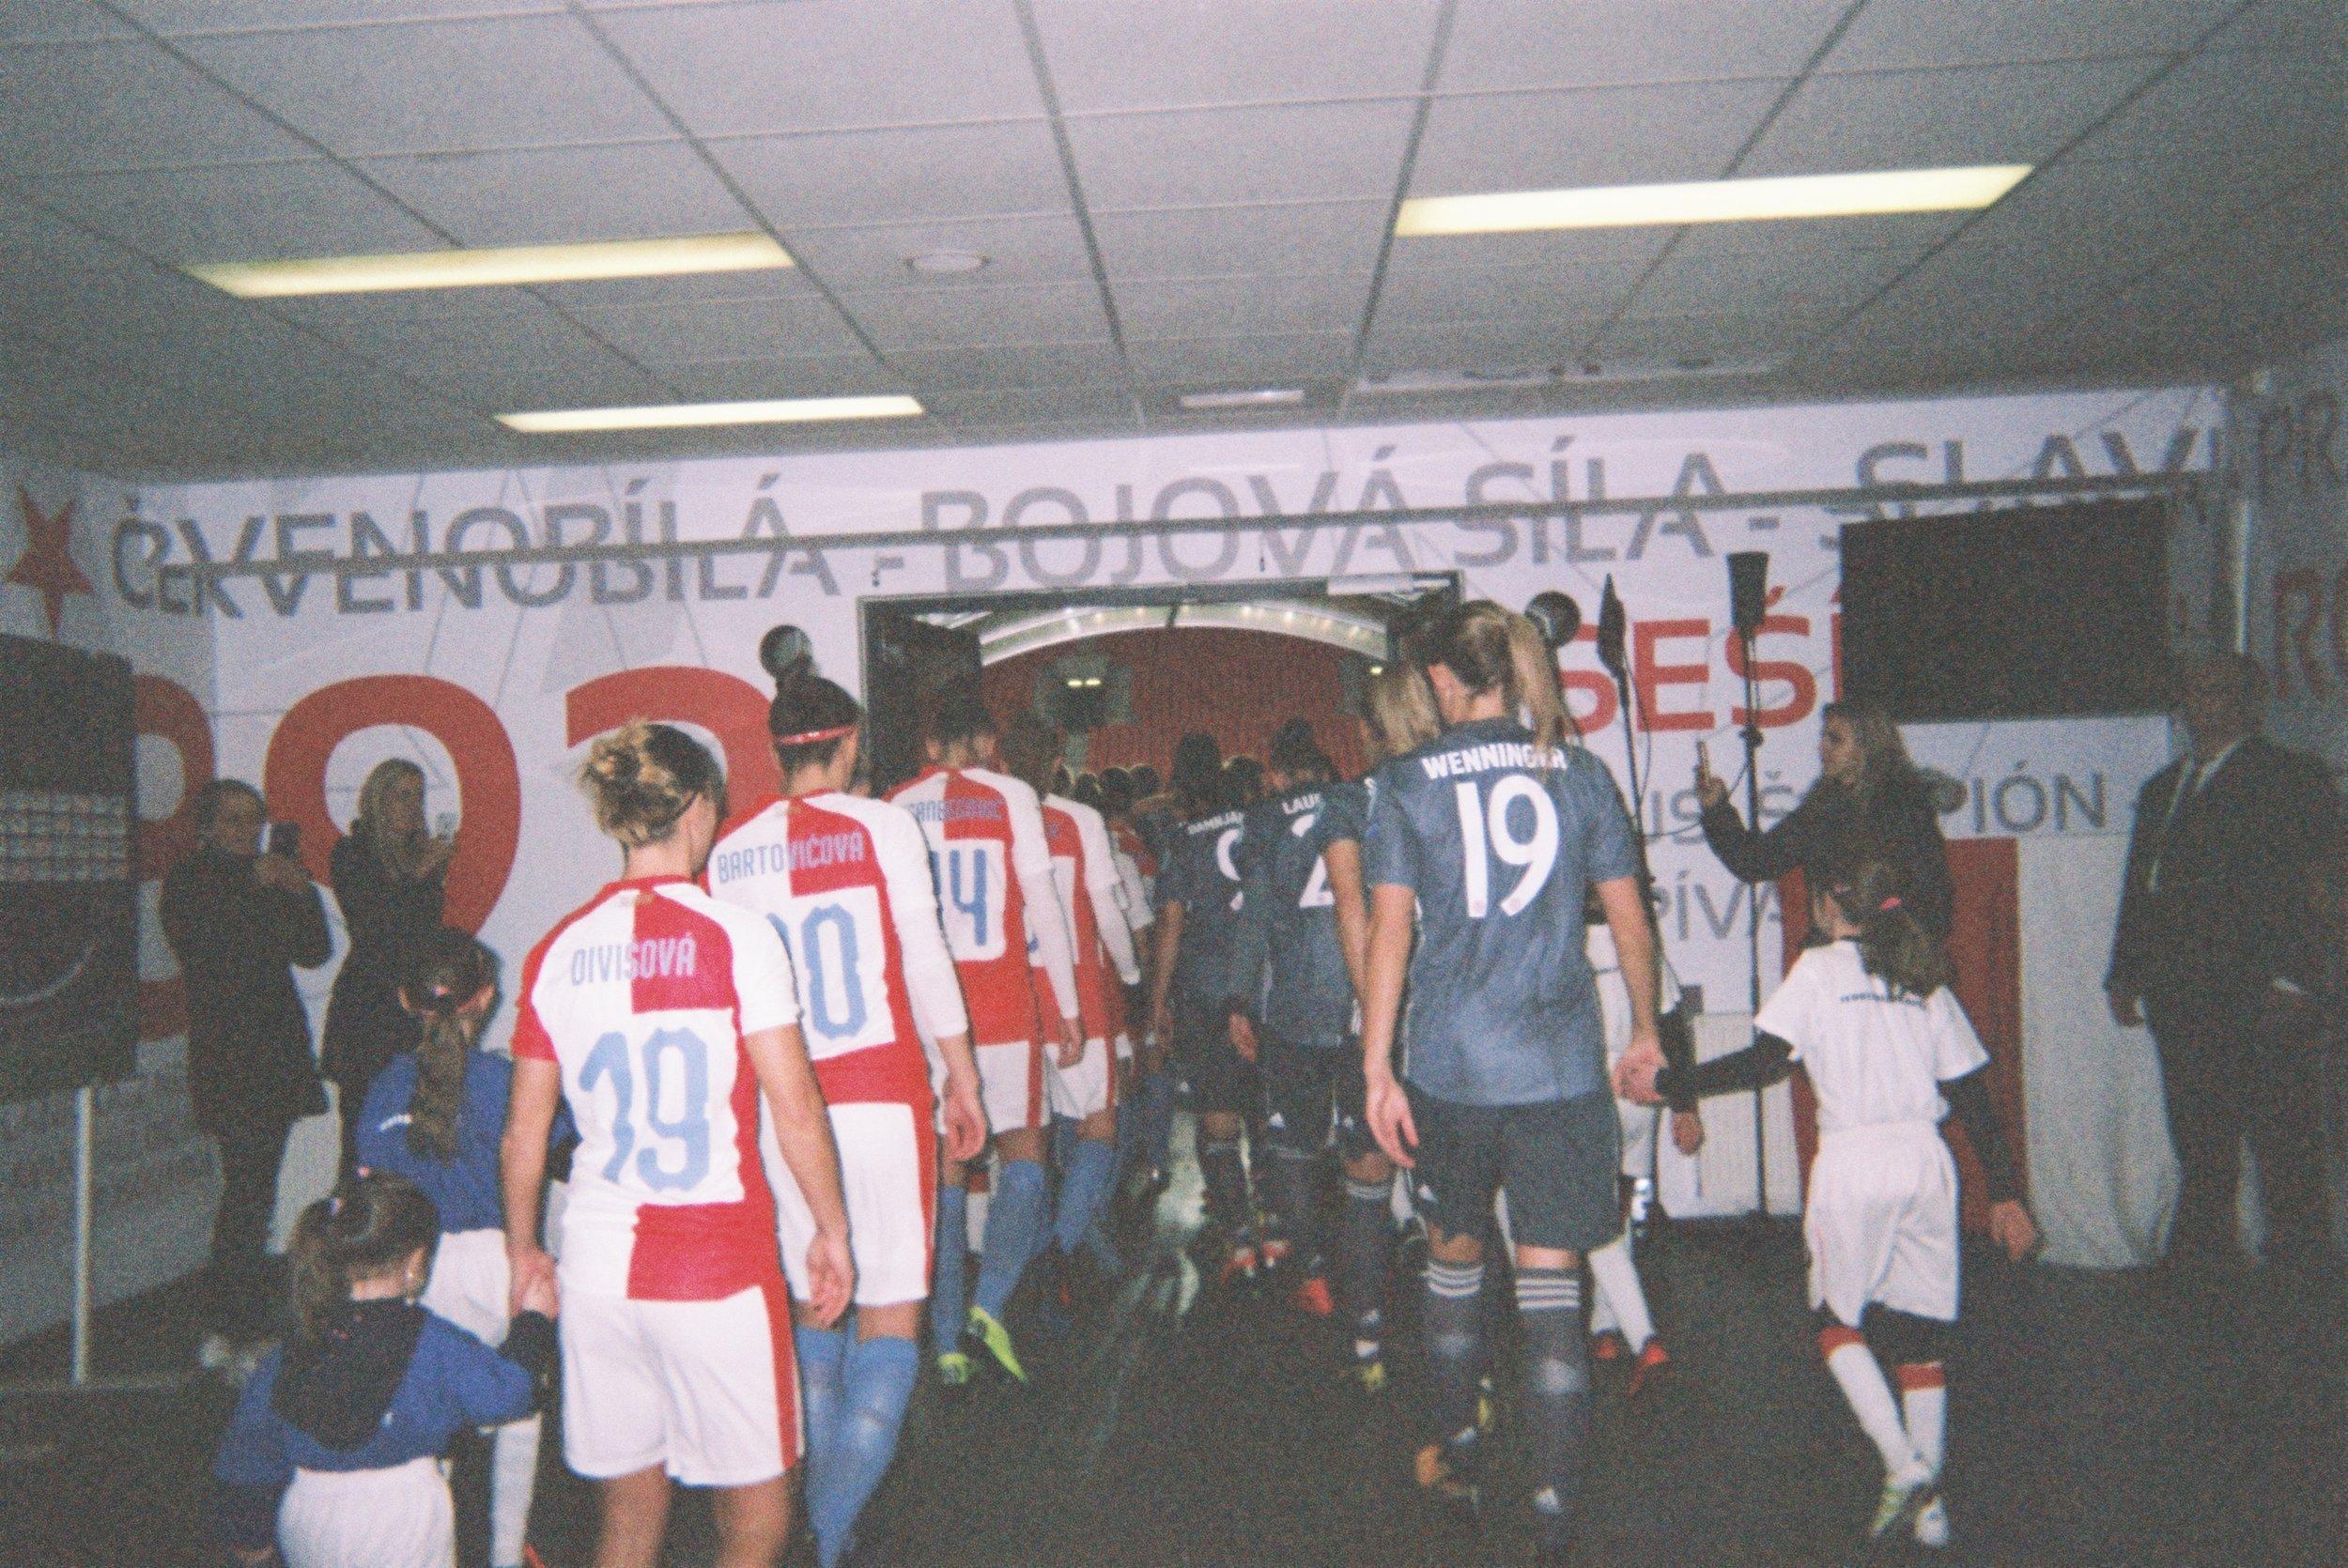 Kylla Sjoman (Slavia) 6.JPG